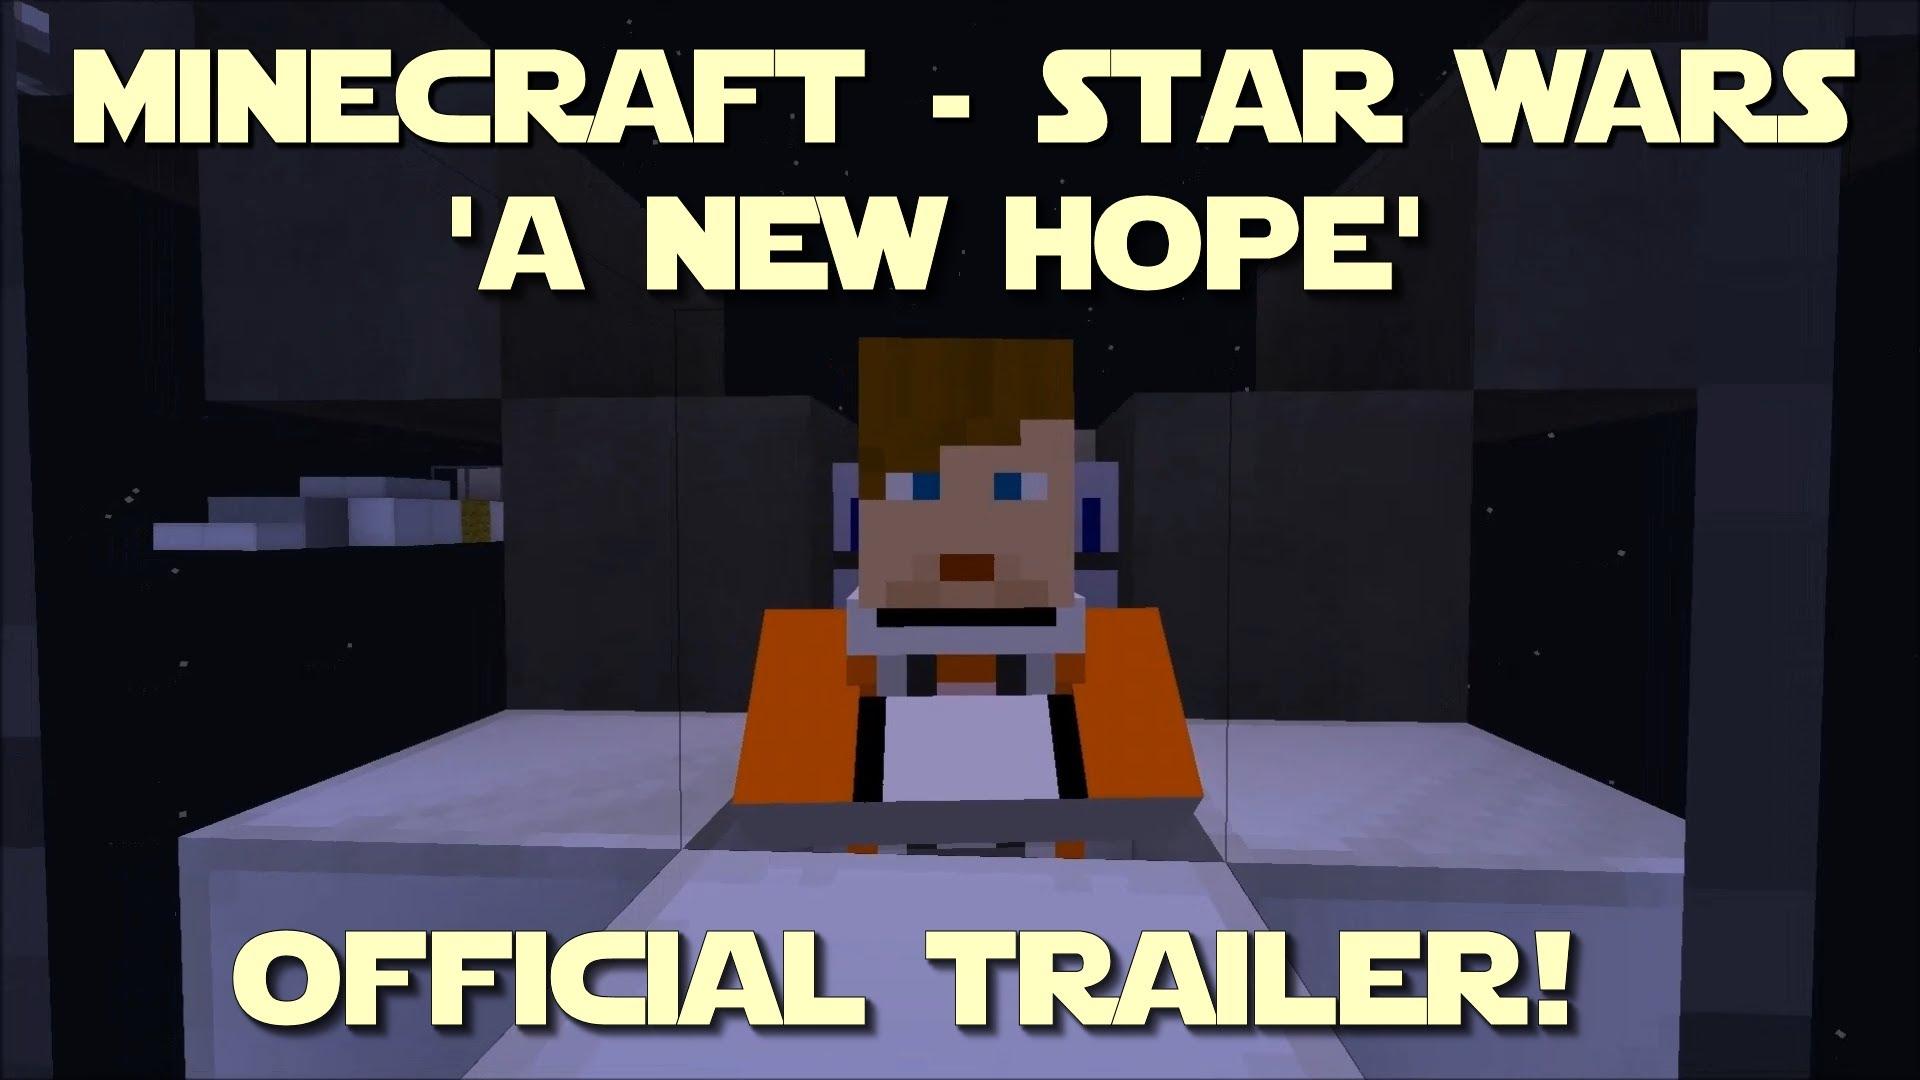 Star Wars recréé avec Minecraft